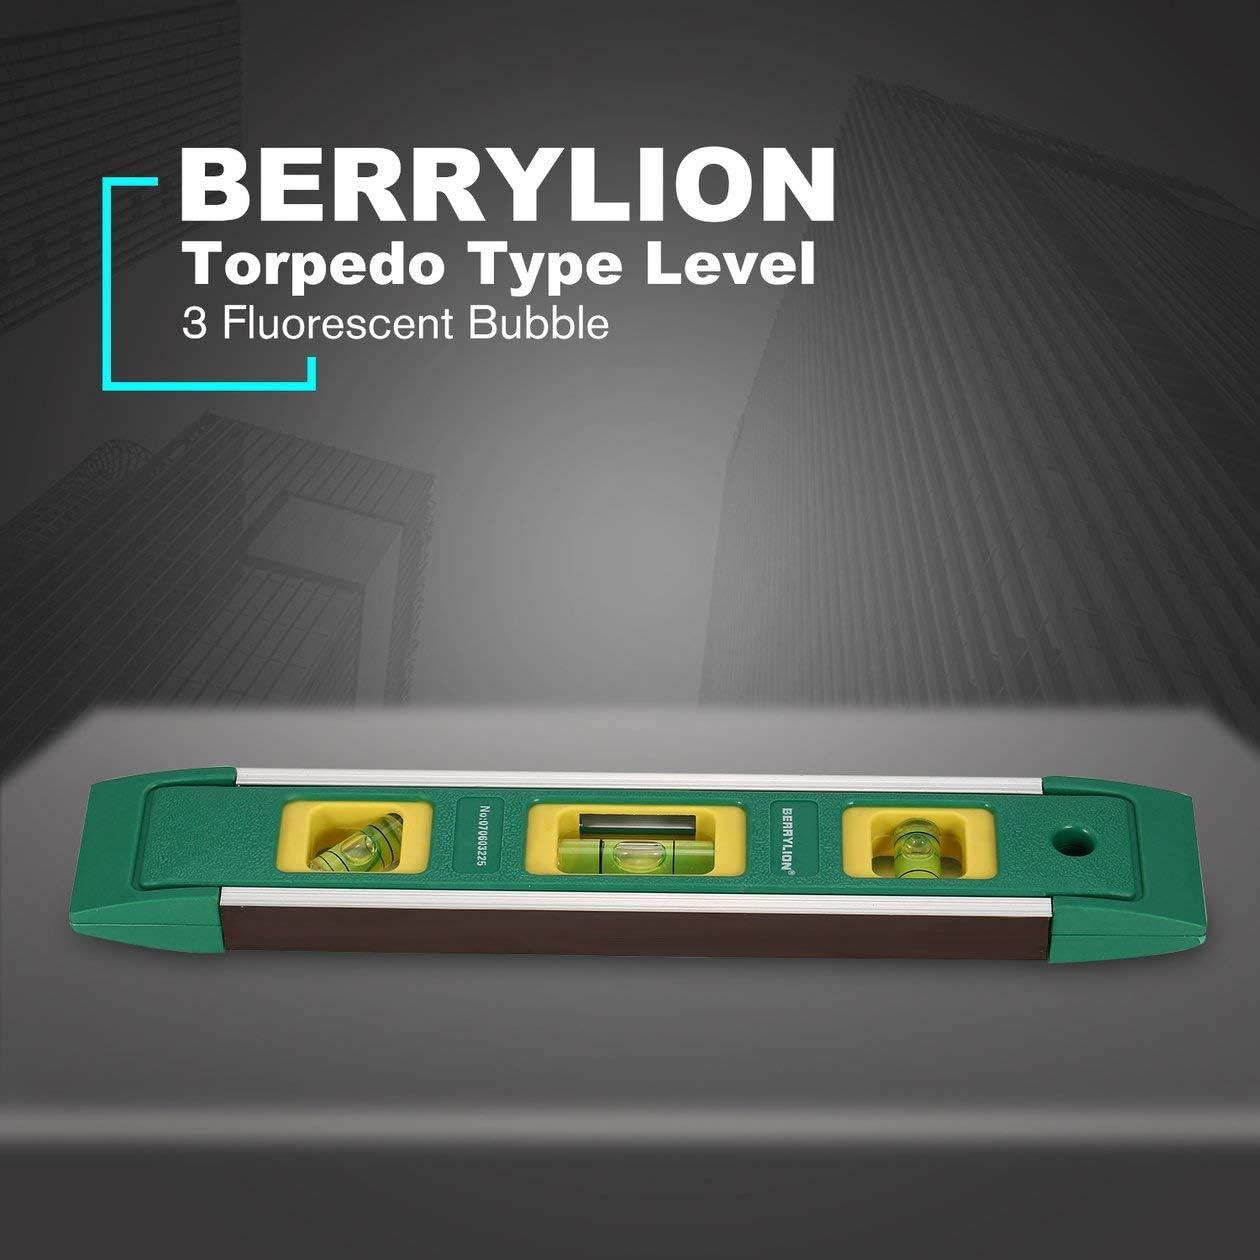 Verde BIYI BERRYLION Tipo de Torpedo Nivel 225 mm Gradienter magn/ético Spirit 3 Regla de Burbuja Fluorescente Herramienta de medici/ón Vertical Horizontal